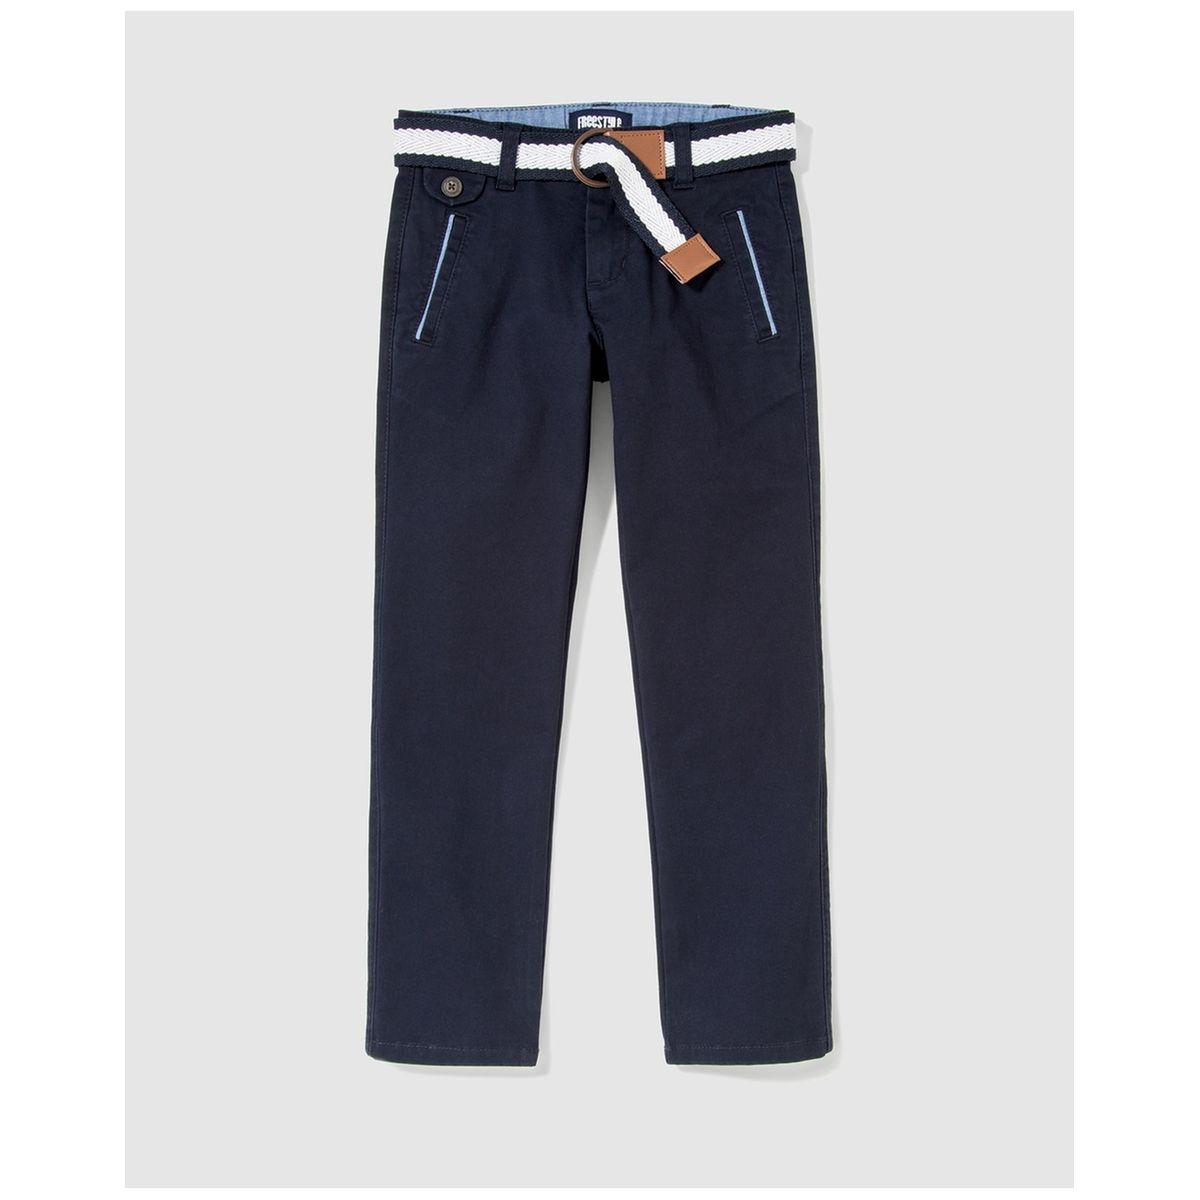 Pantalon chino  à ceinture